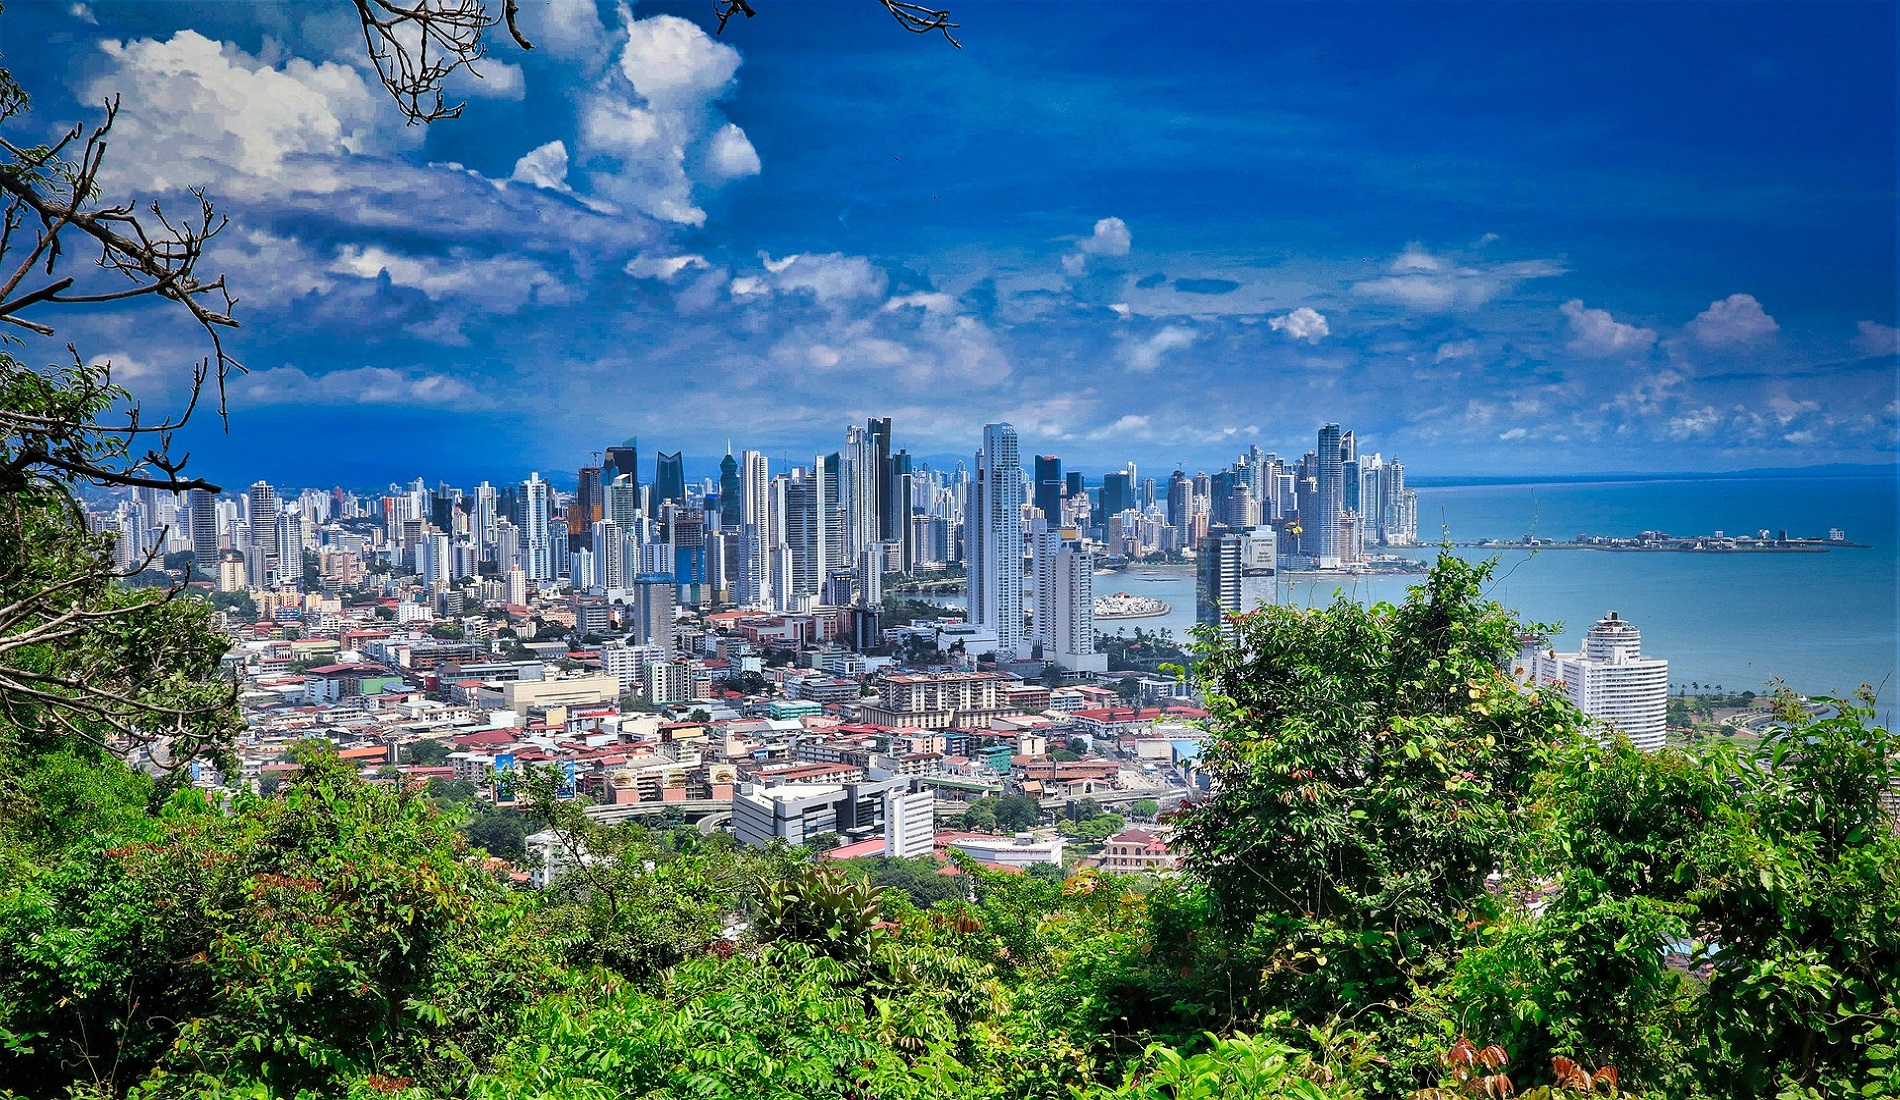 Panama-Stad uitzicht